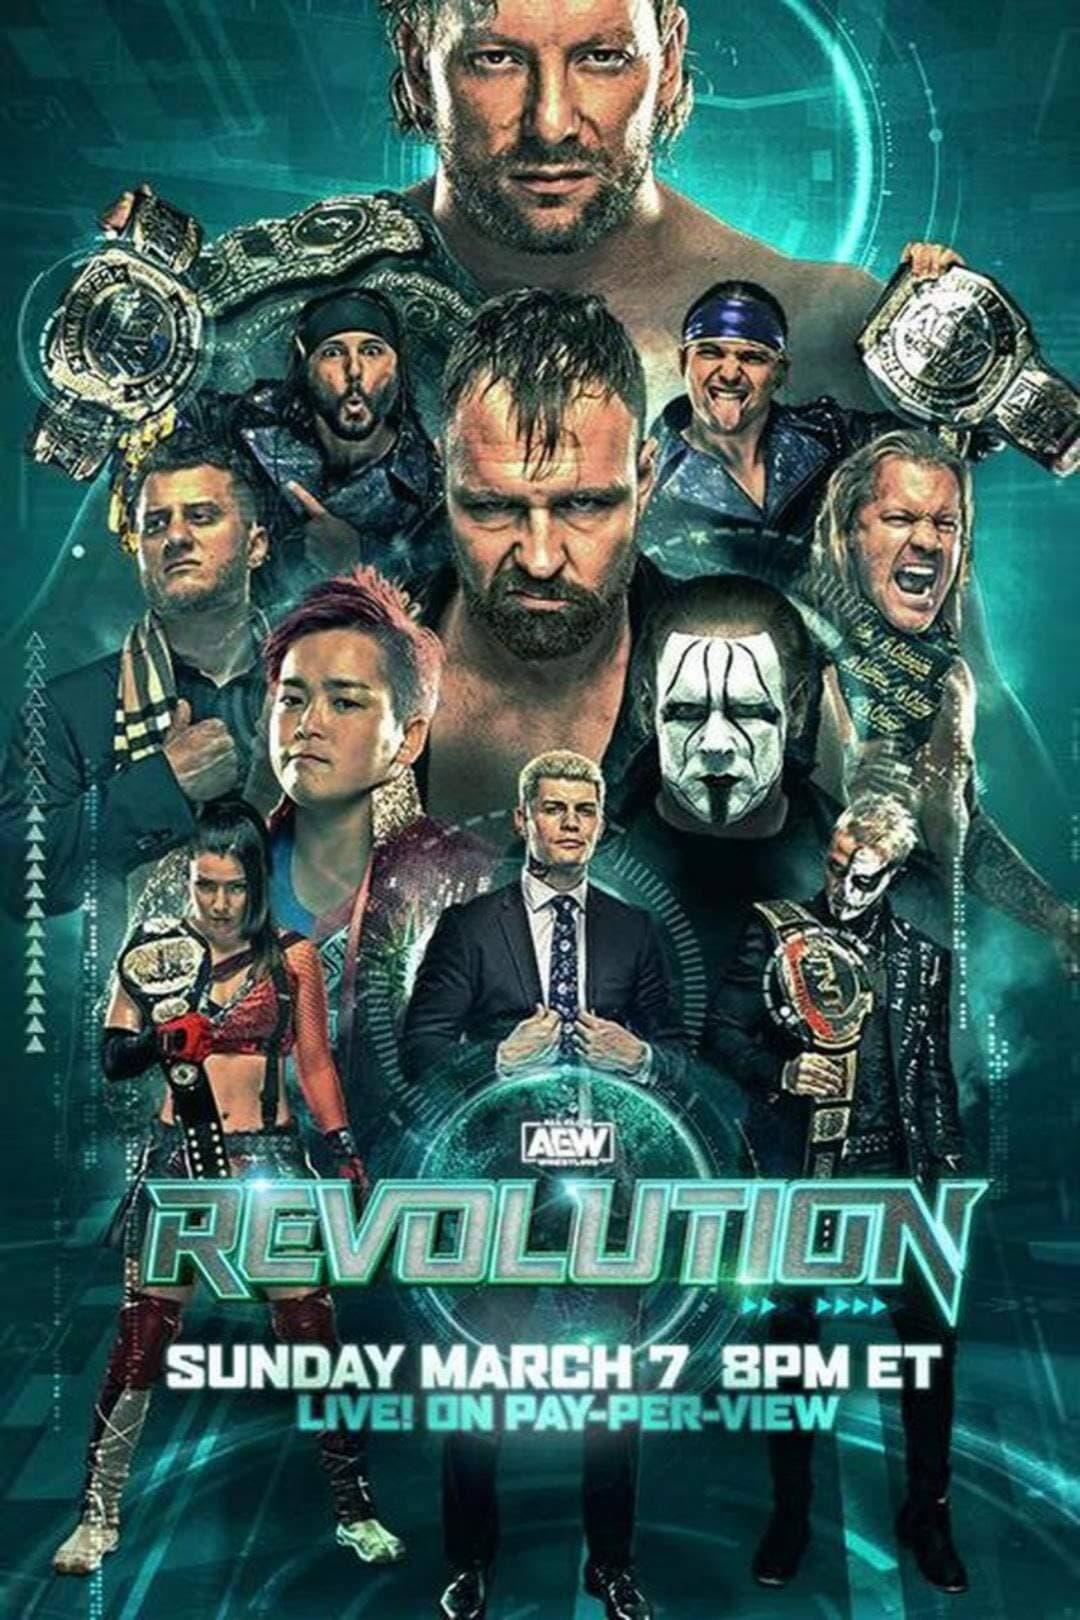 Poster: AEW Revolution 2021